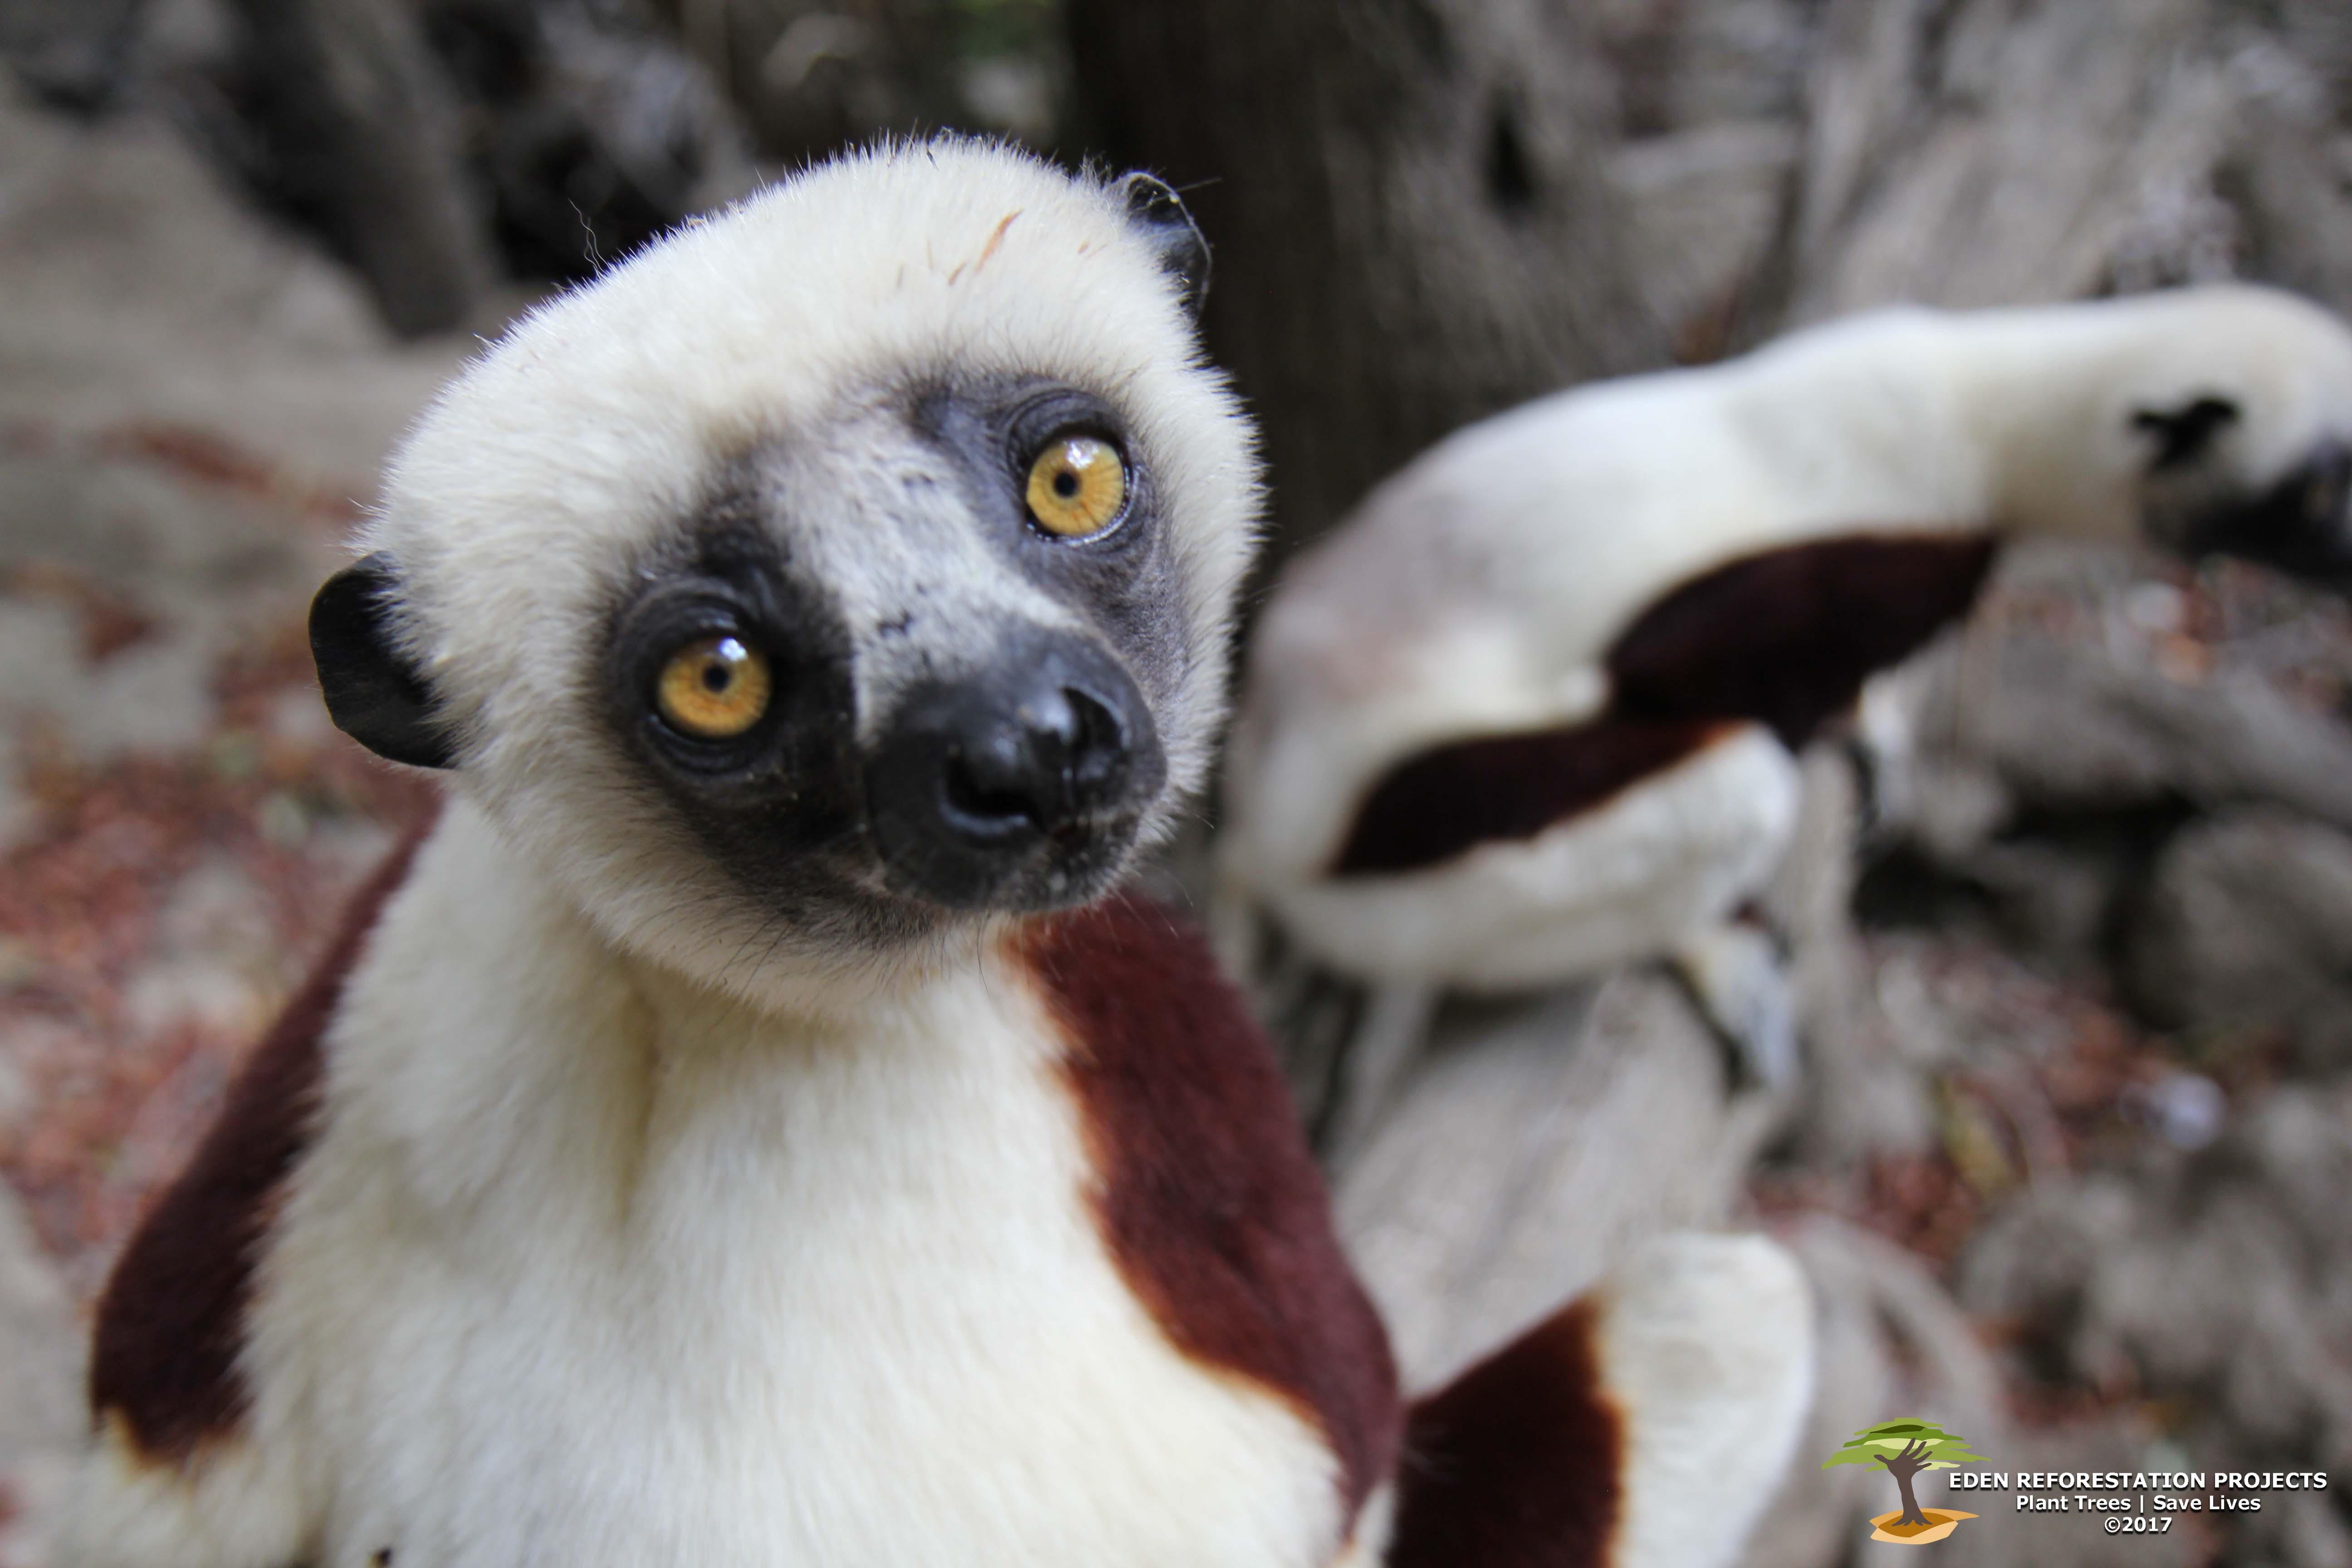 Endangered-Sifaka-with-watermark